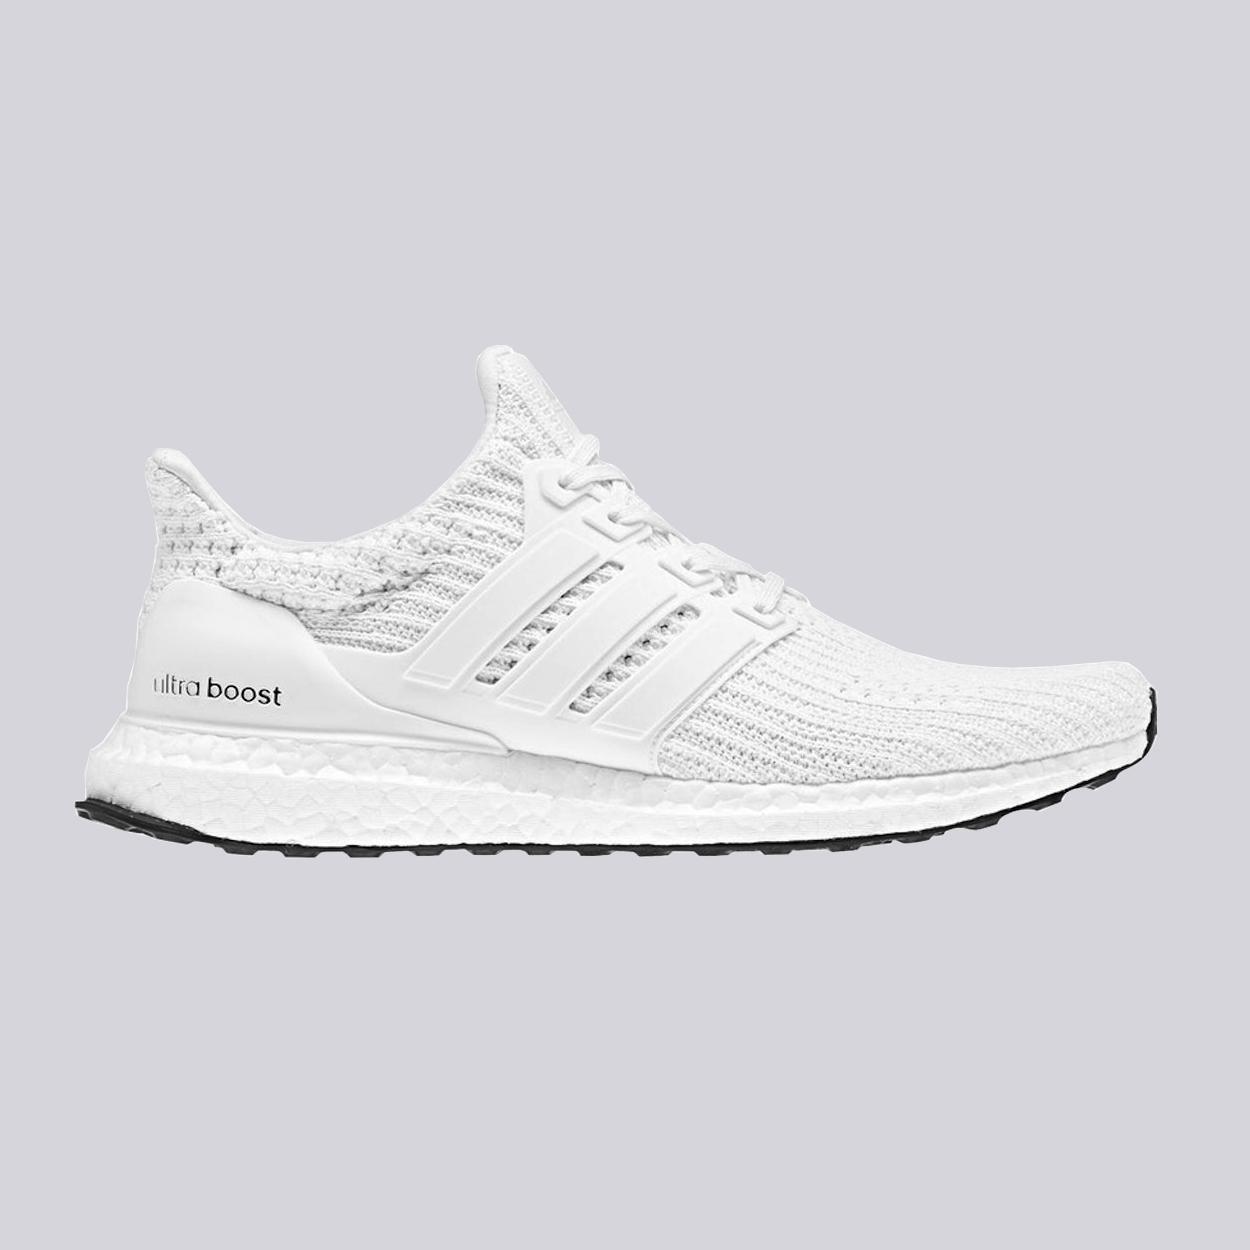 6878228d1a103 Giày Sneaker Adidas Ultra Boost 4.0 Triple White